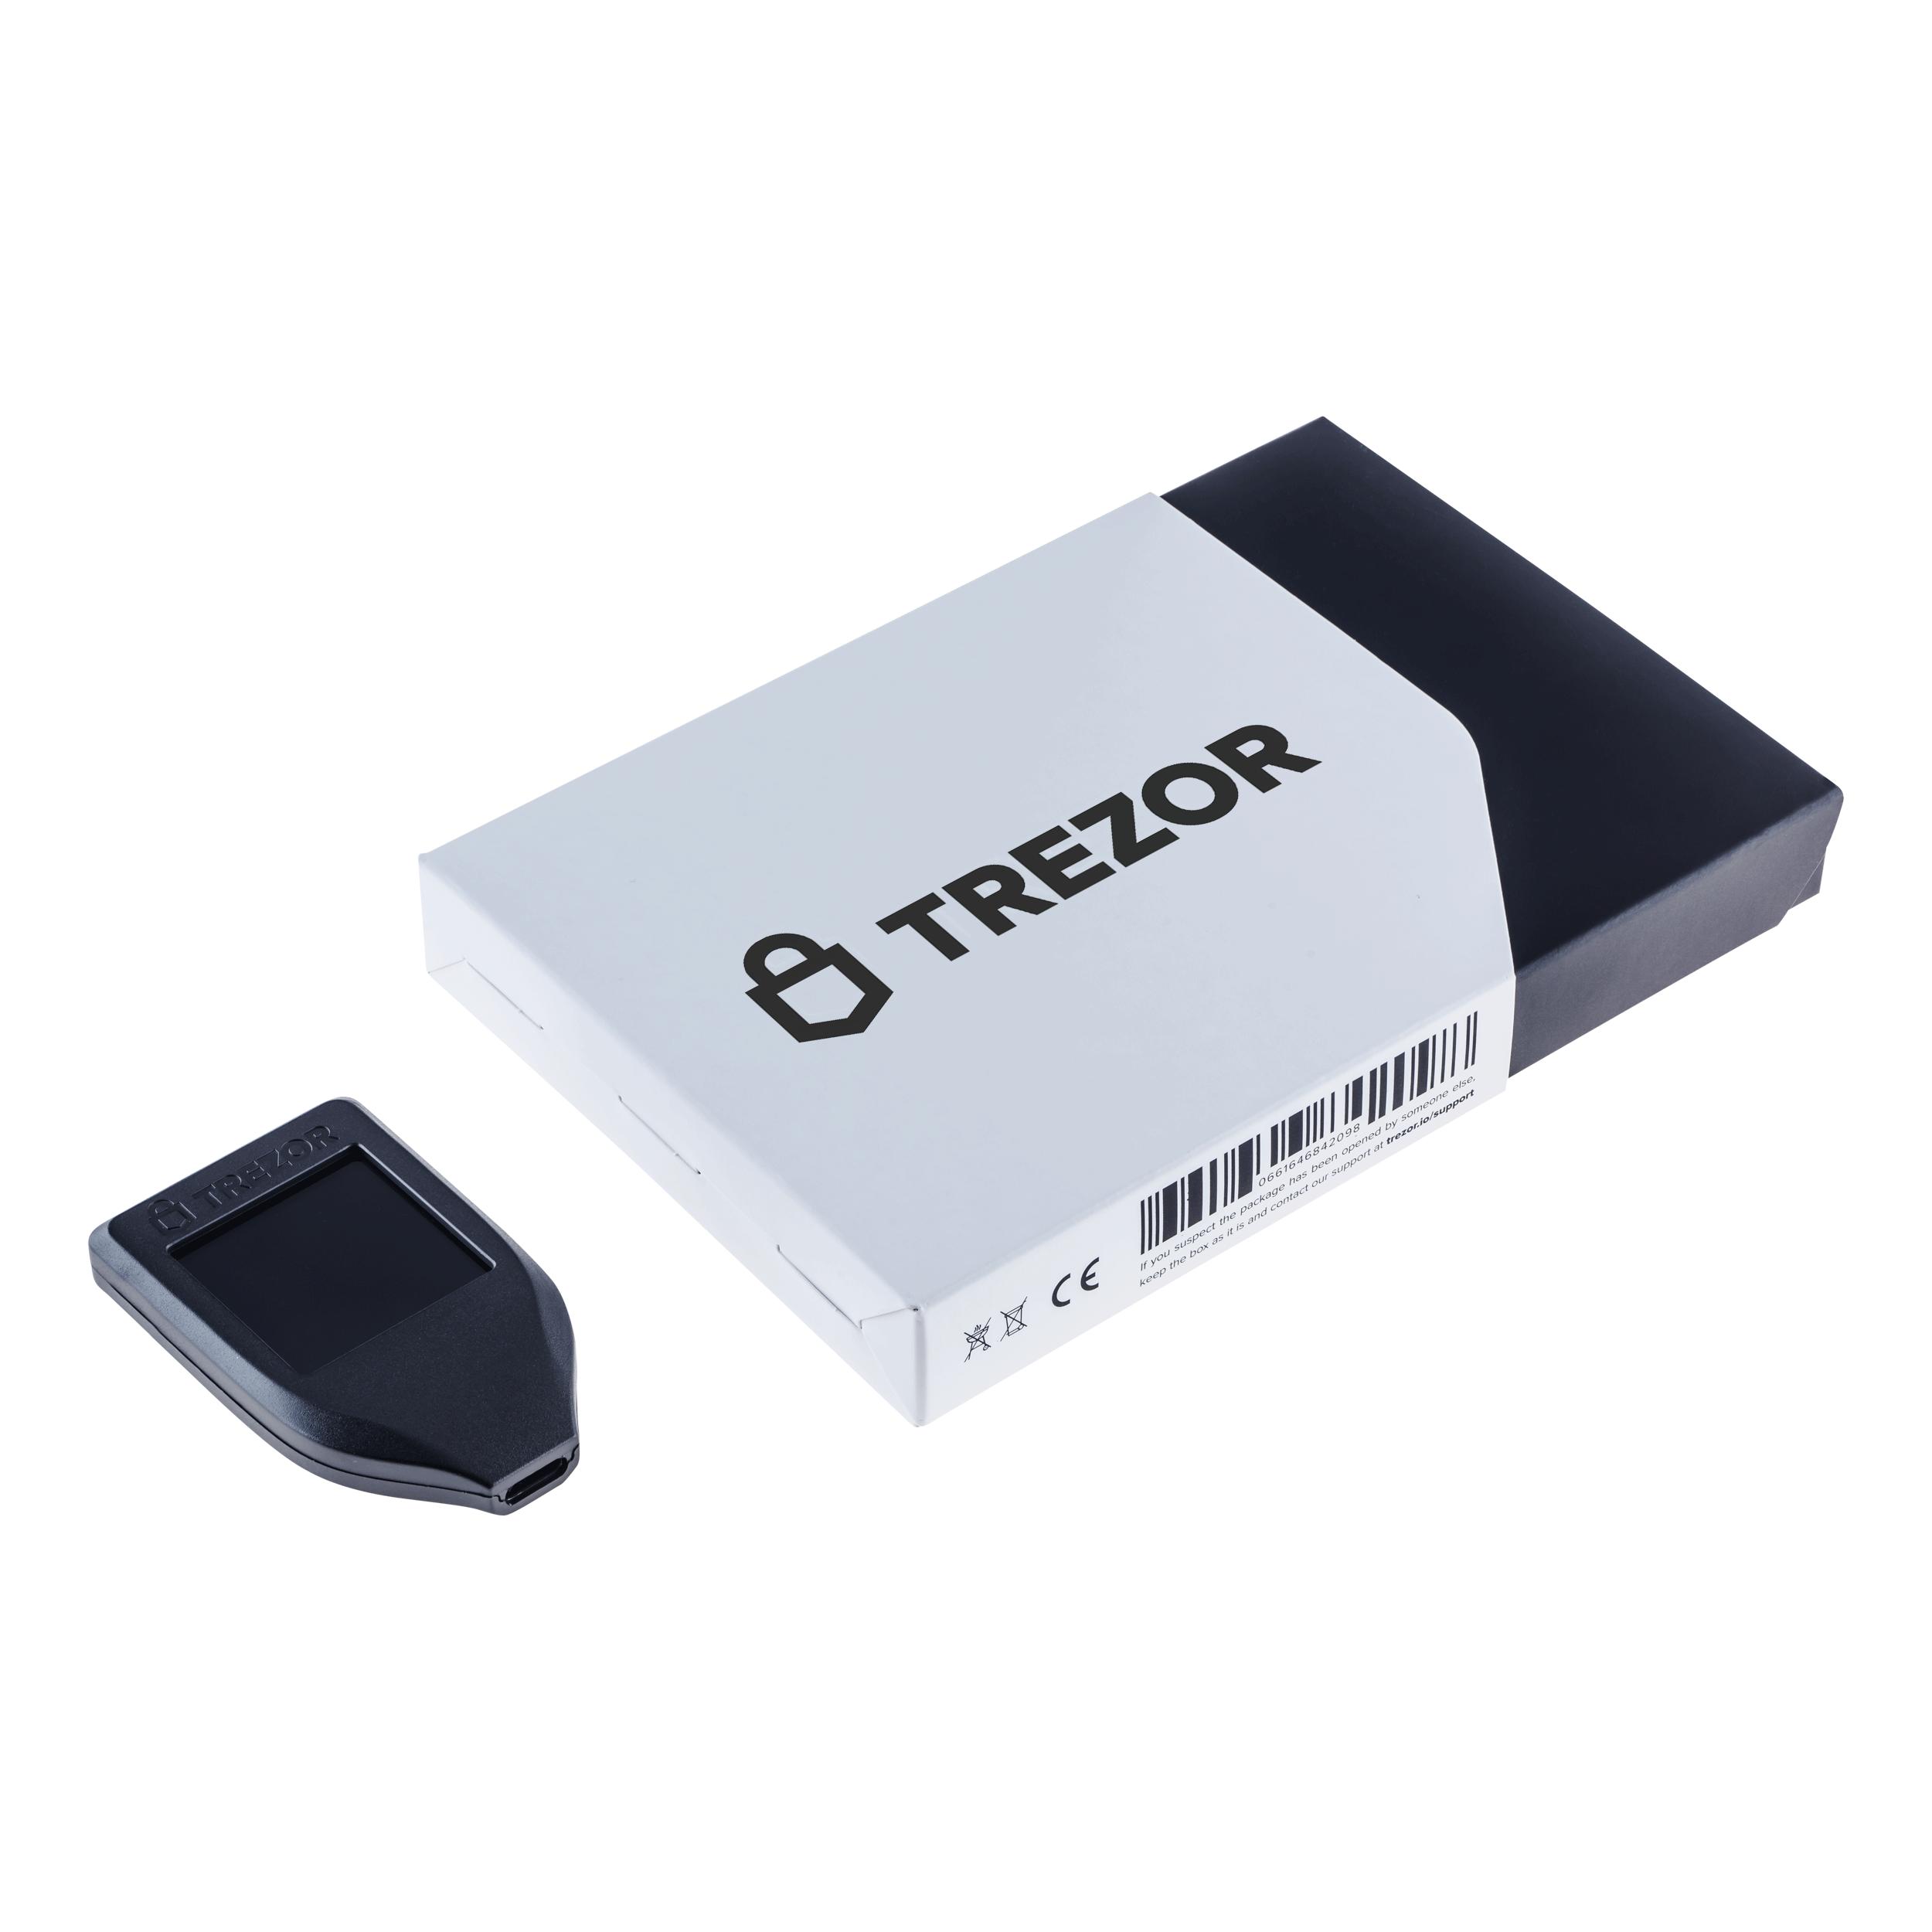 trezor_model_t_box_002.png